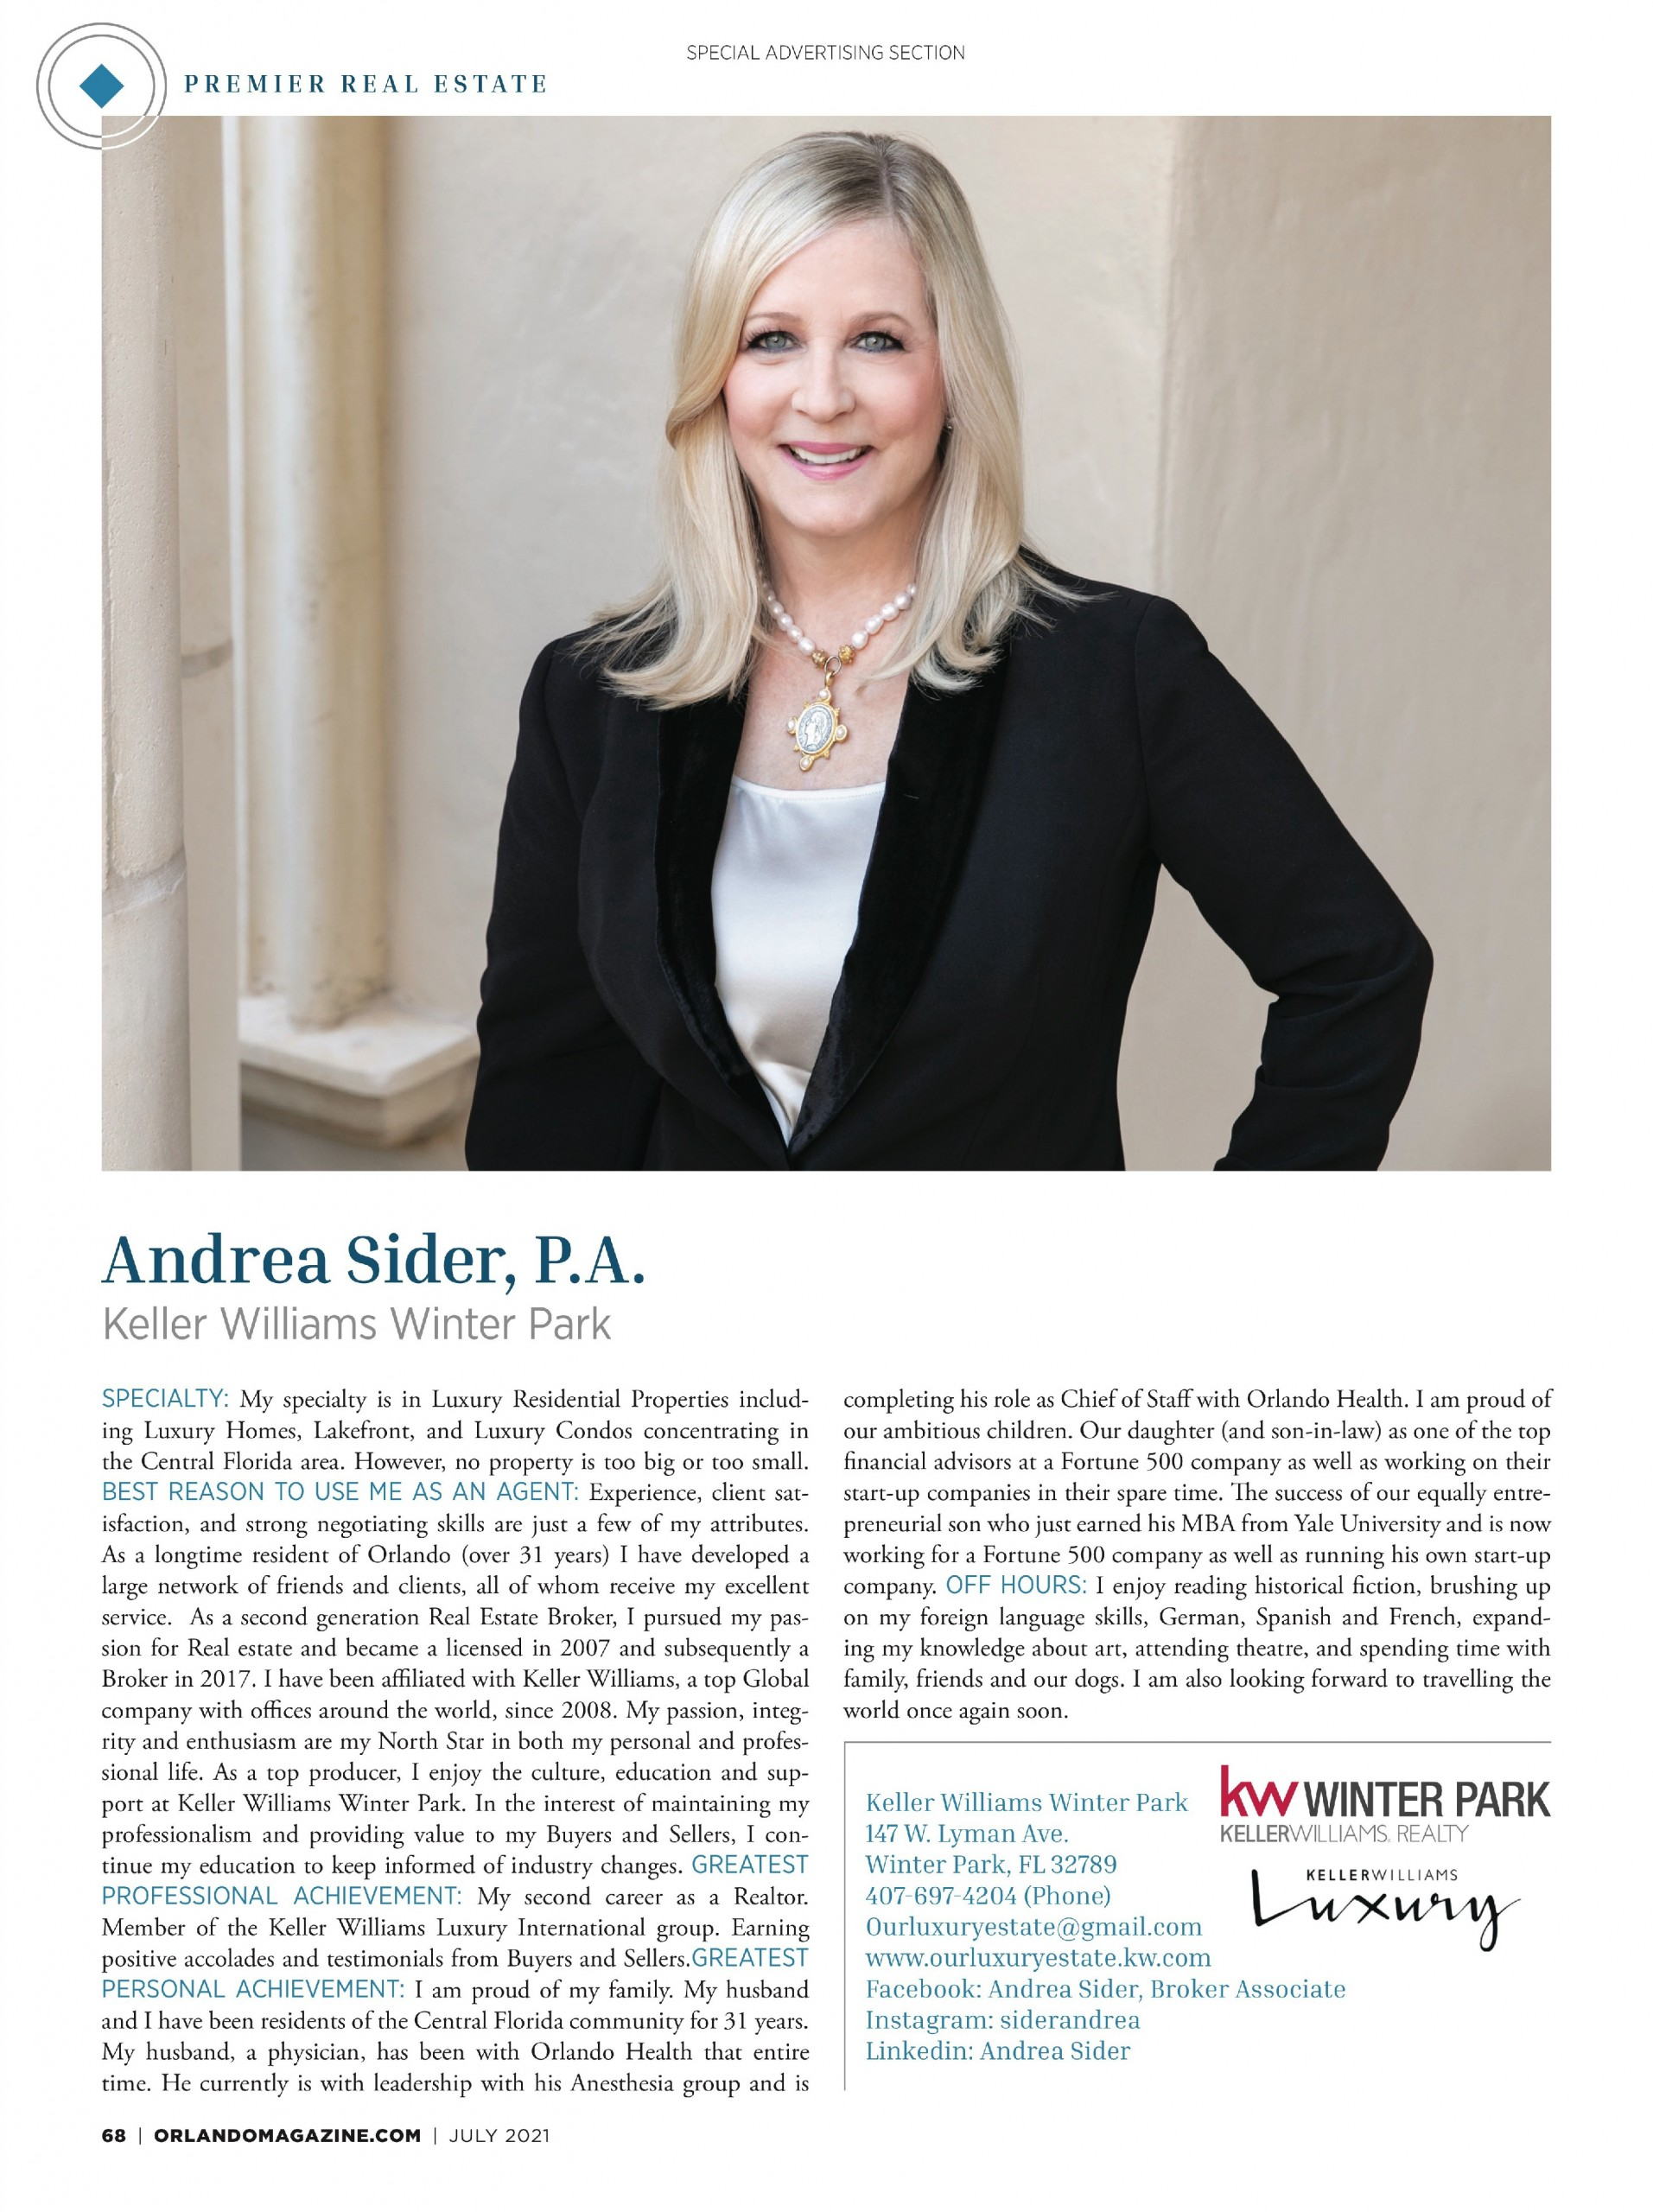 Sider, Andrea